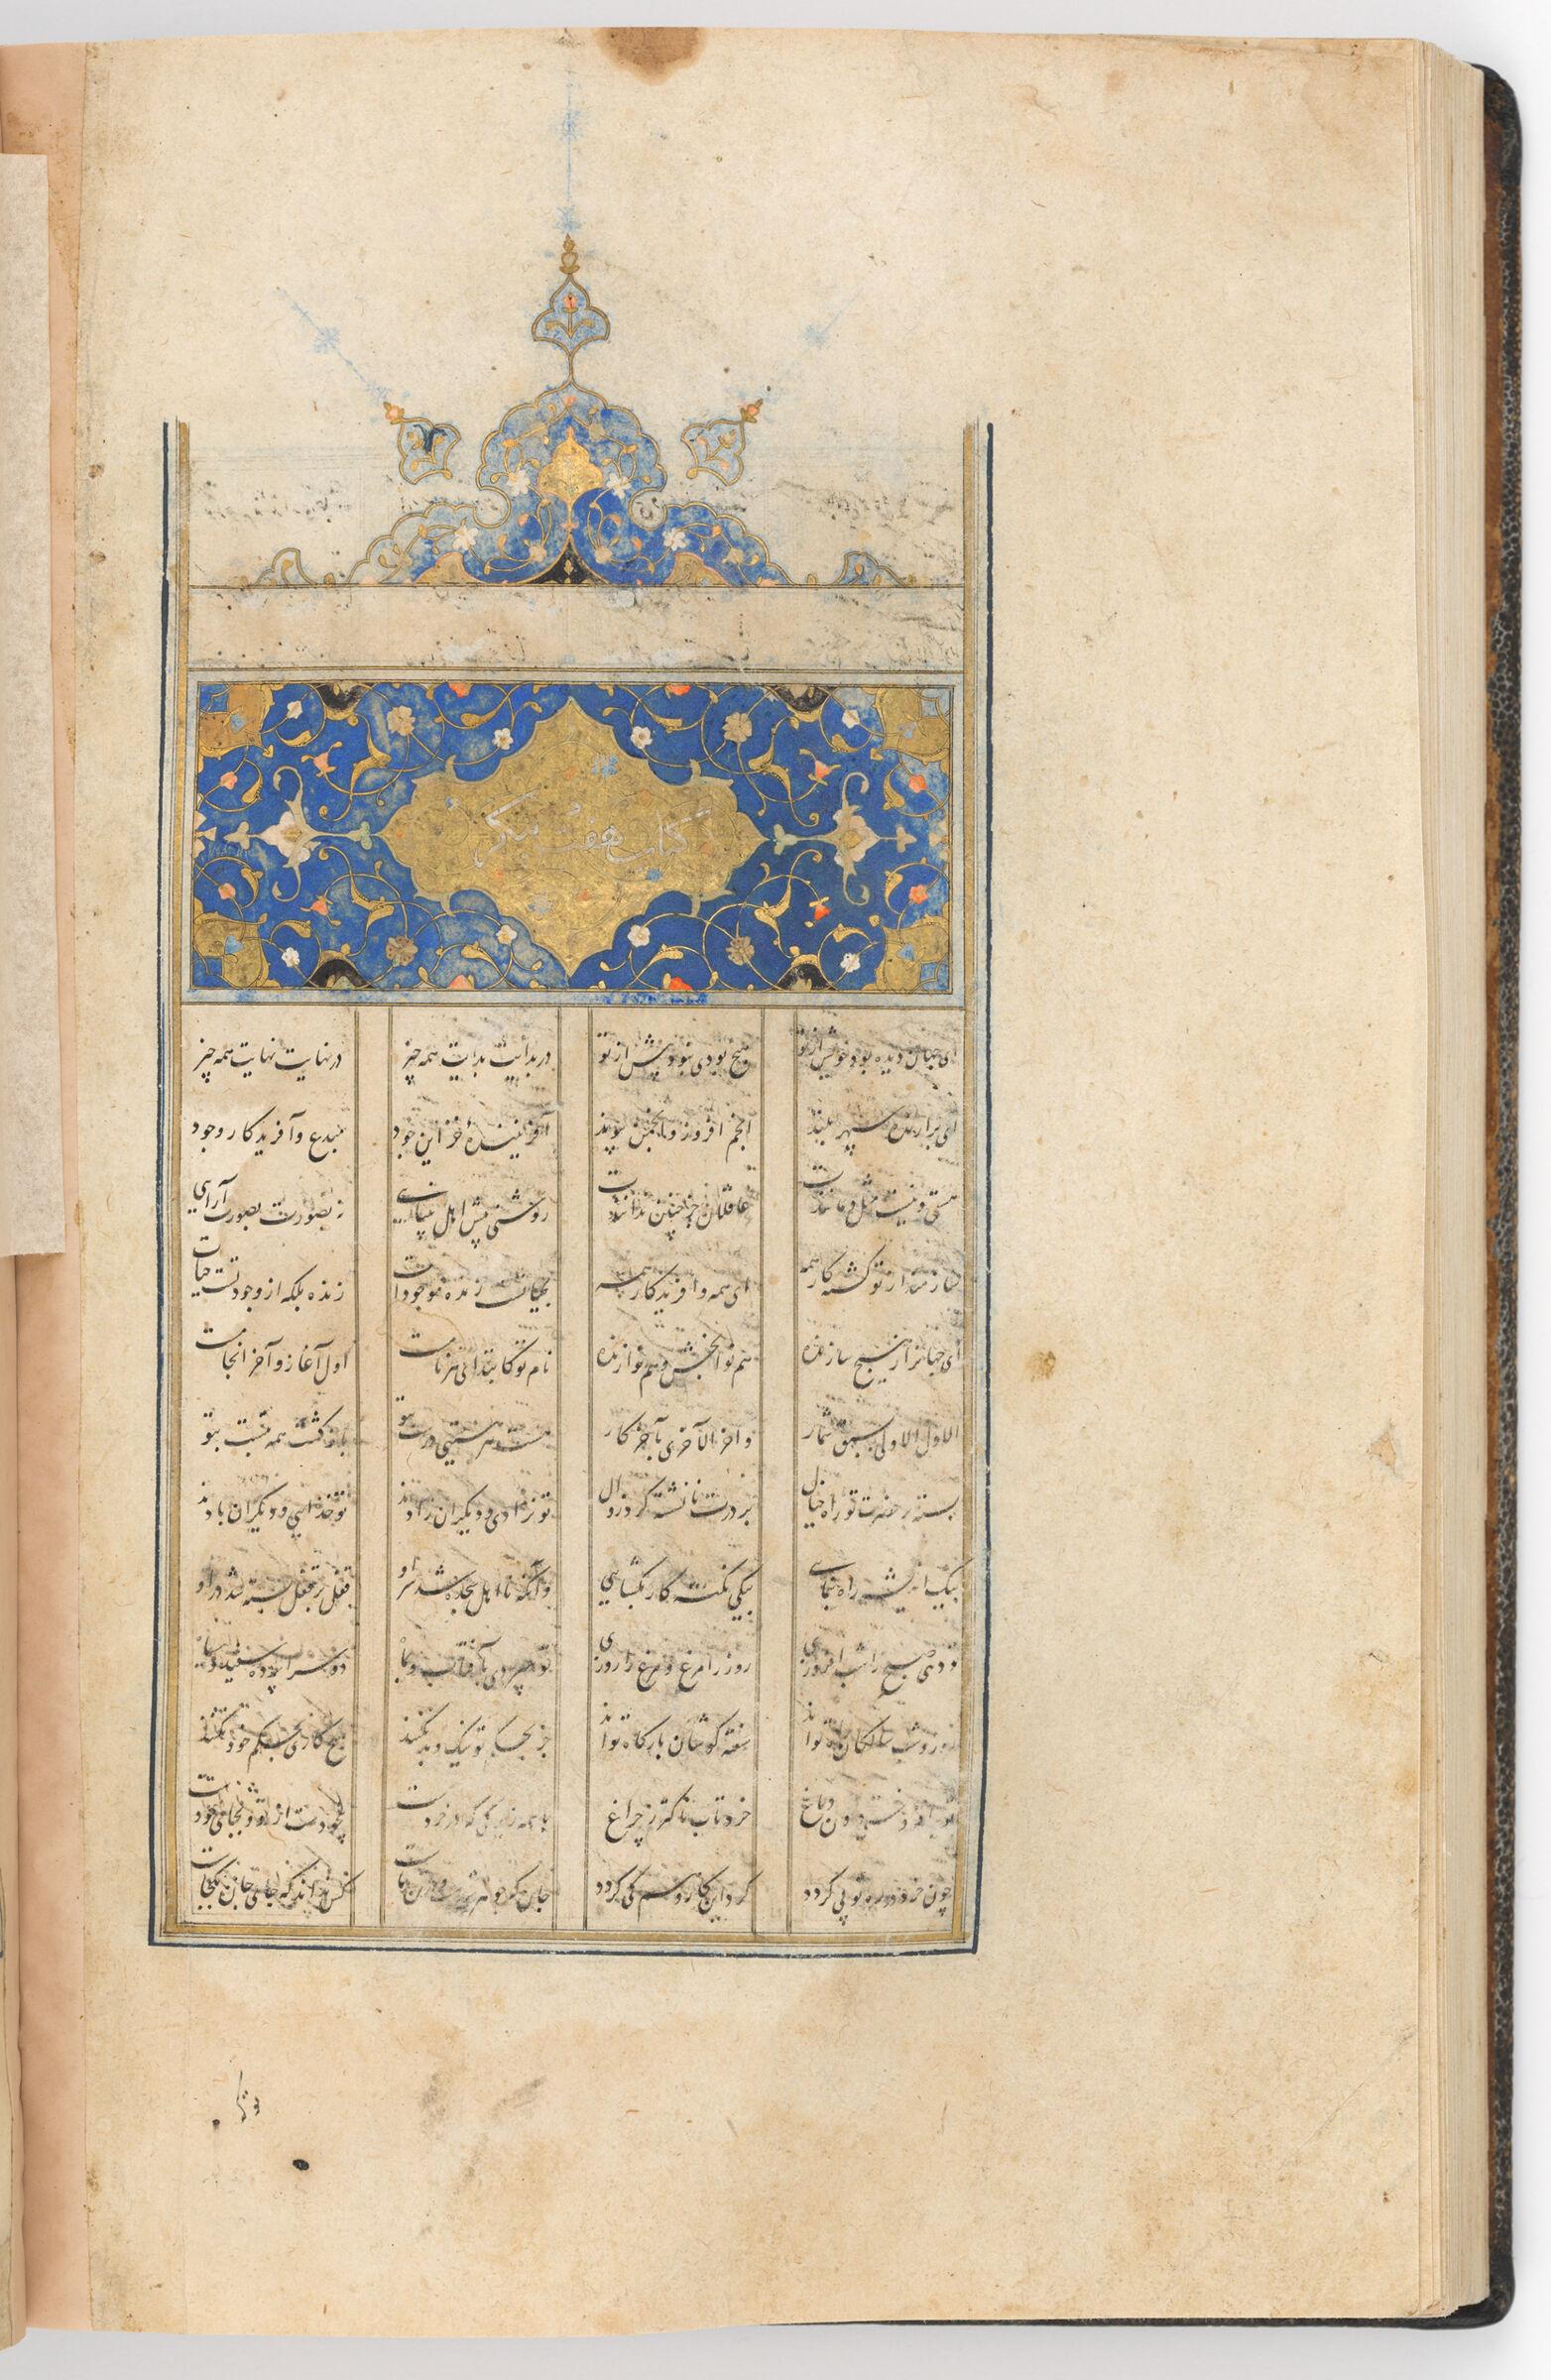 Illuminated Sarlawh Of Haft Paykar (Text Recto; Illumination Verso Of Folio 181) Sarlawh From A Manuscript Of The Khamsa By Nizami